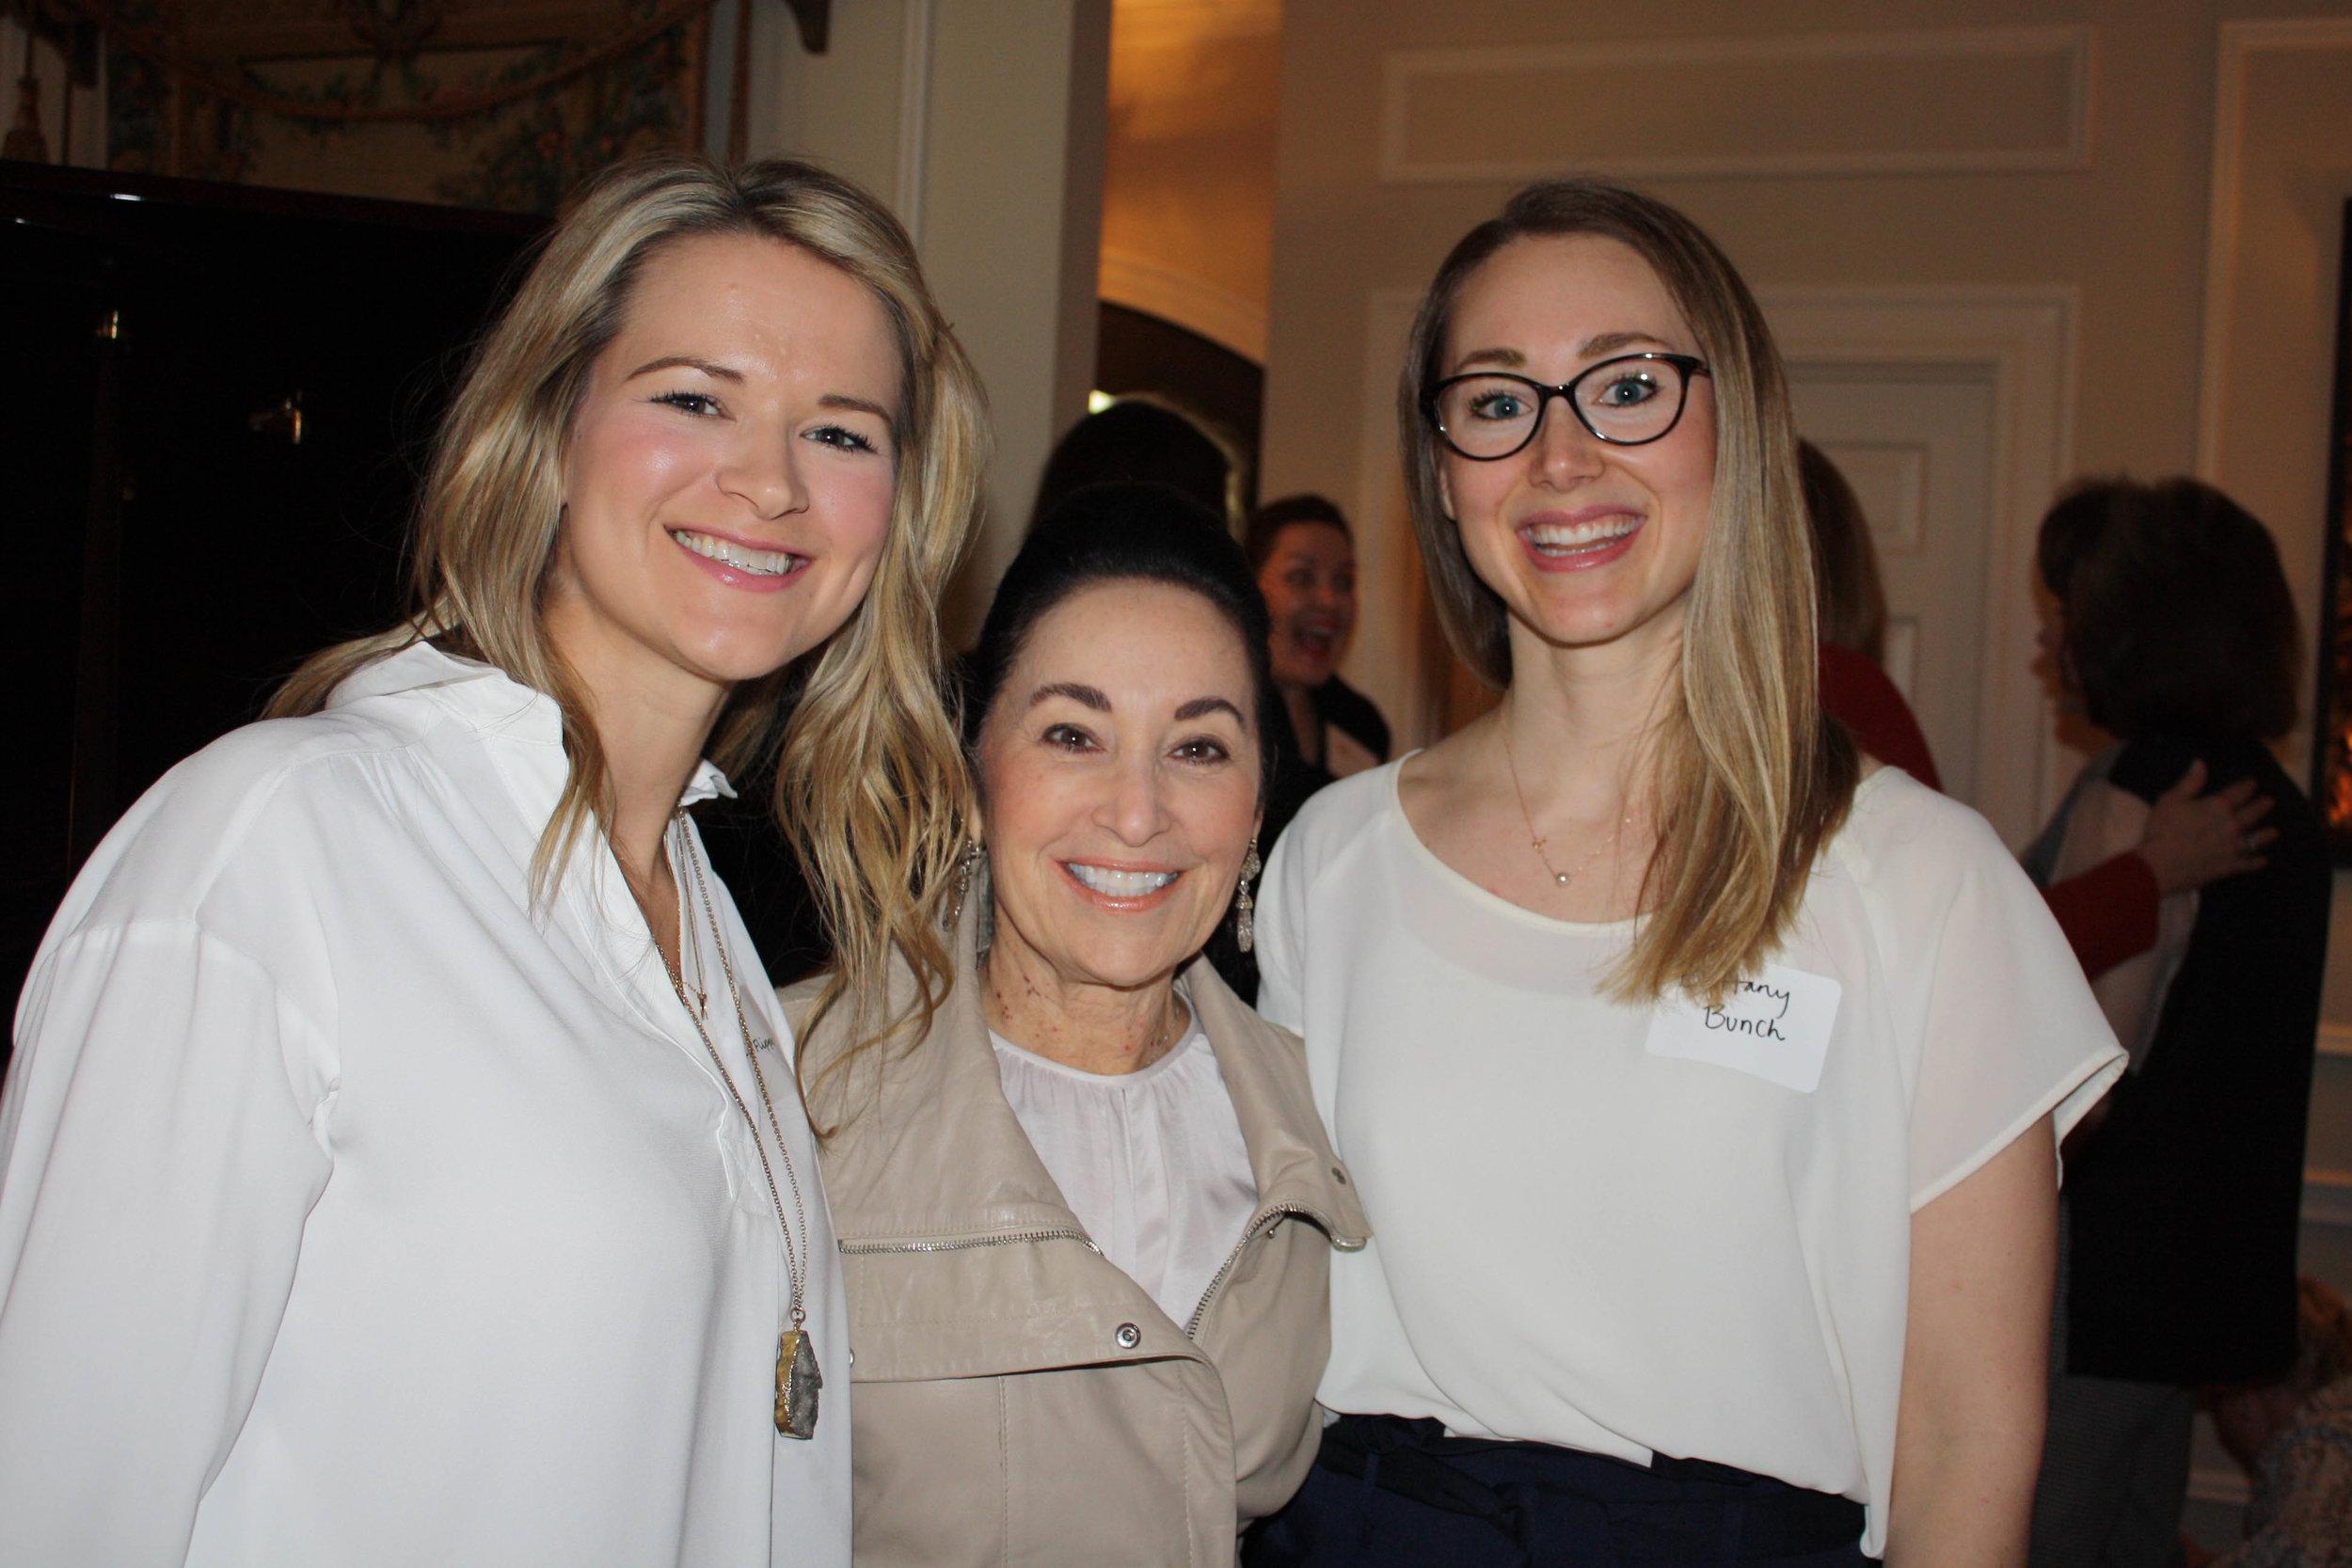 Liz Flippo, Barbara Glick and Dr. Brittany Bunch